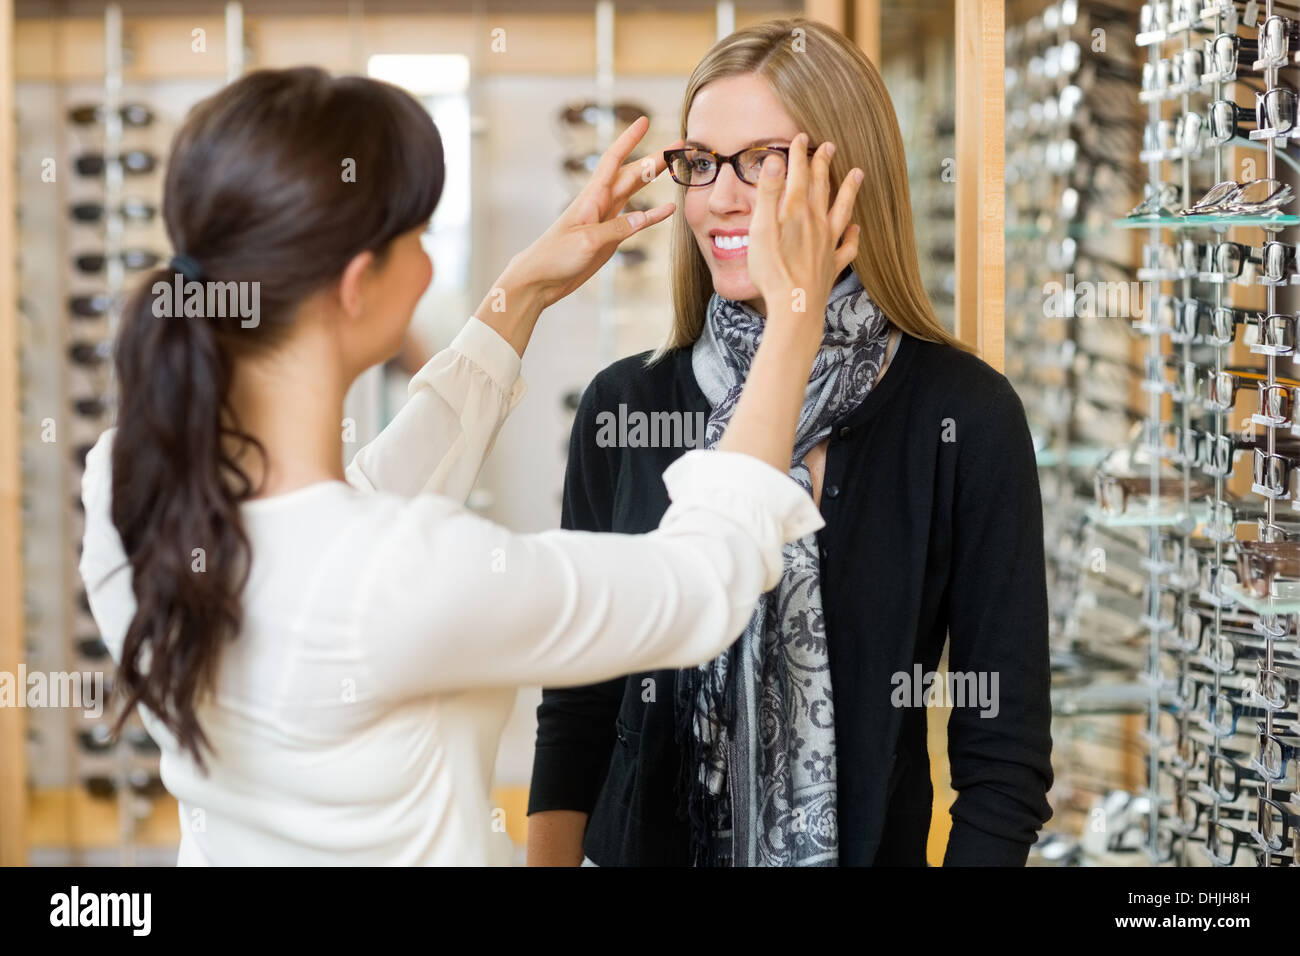 Salesgirl Assisting Customer To In Wearing Glasses - Stock Image